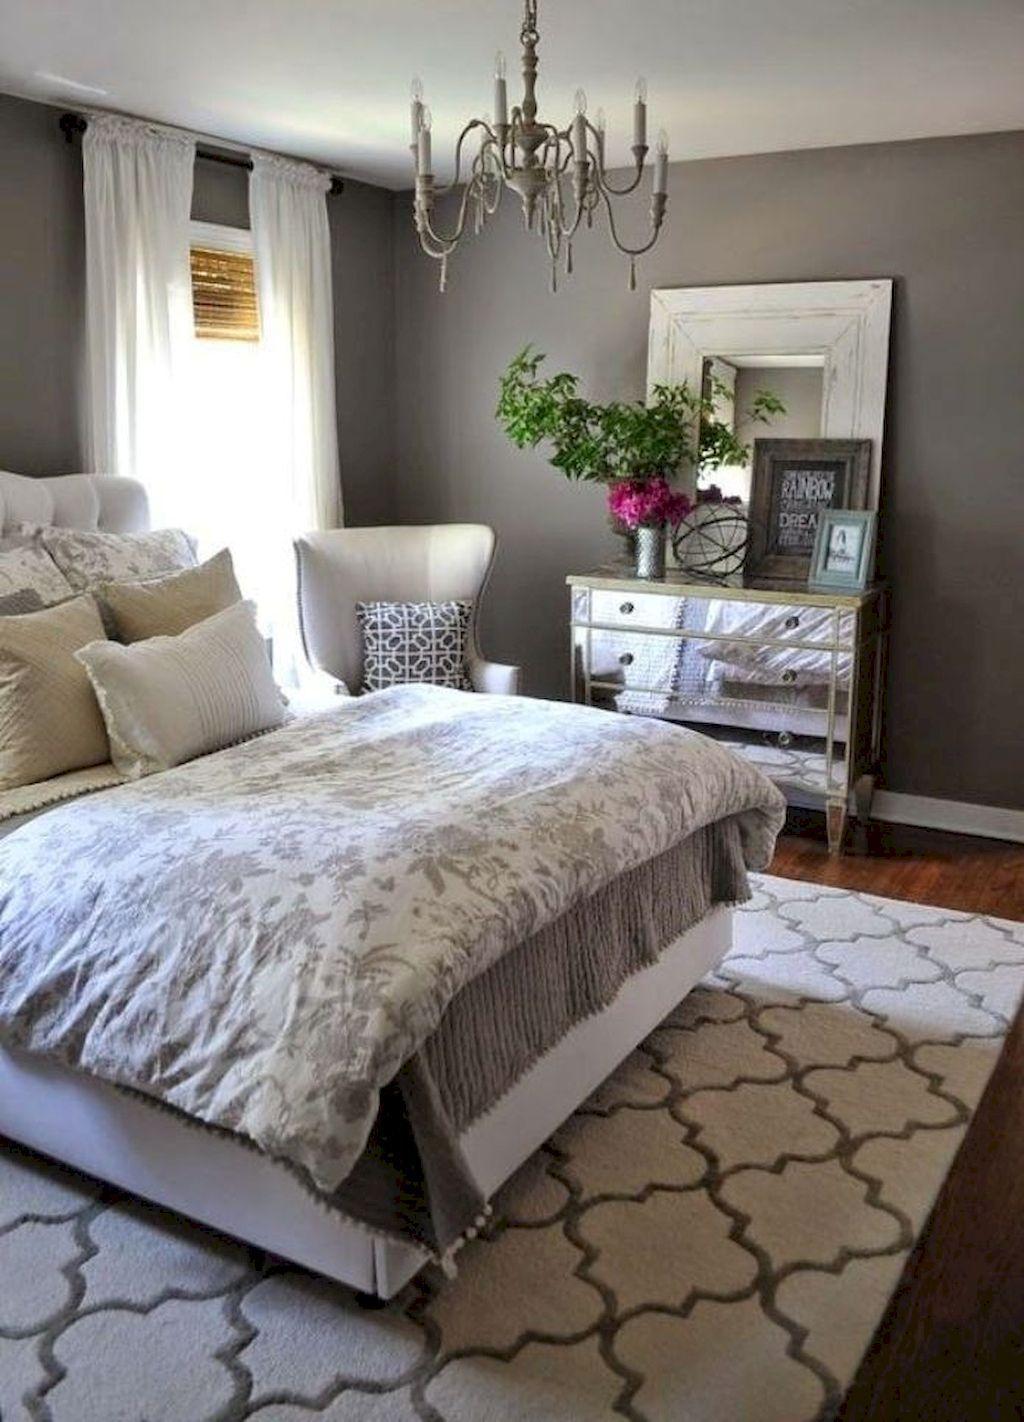 Master bedroom ideas grey  Beautiful master bedroom decorating ideas   Home ideas